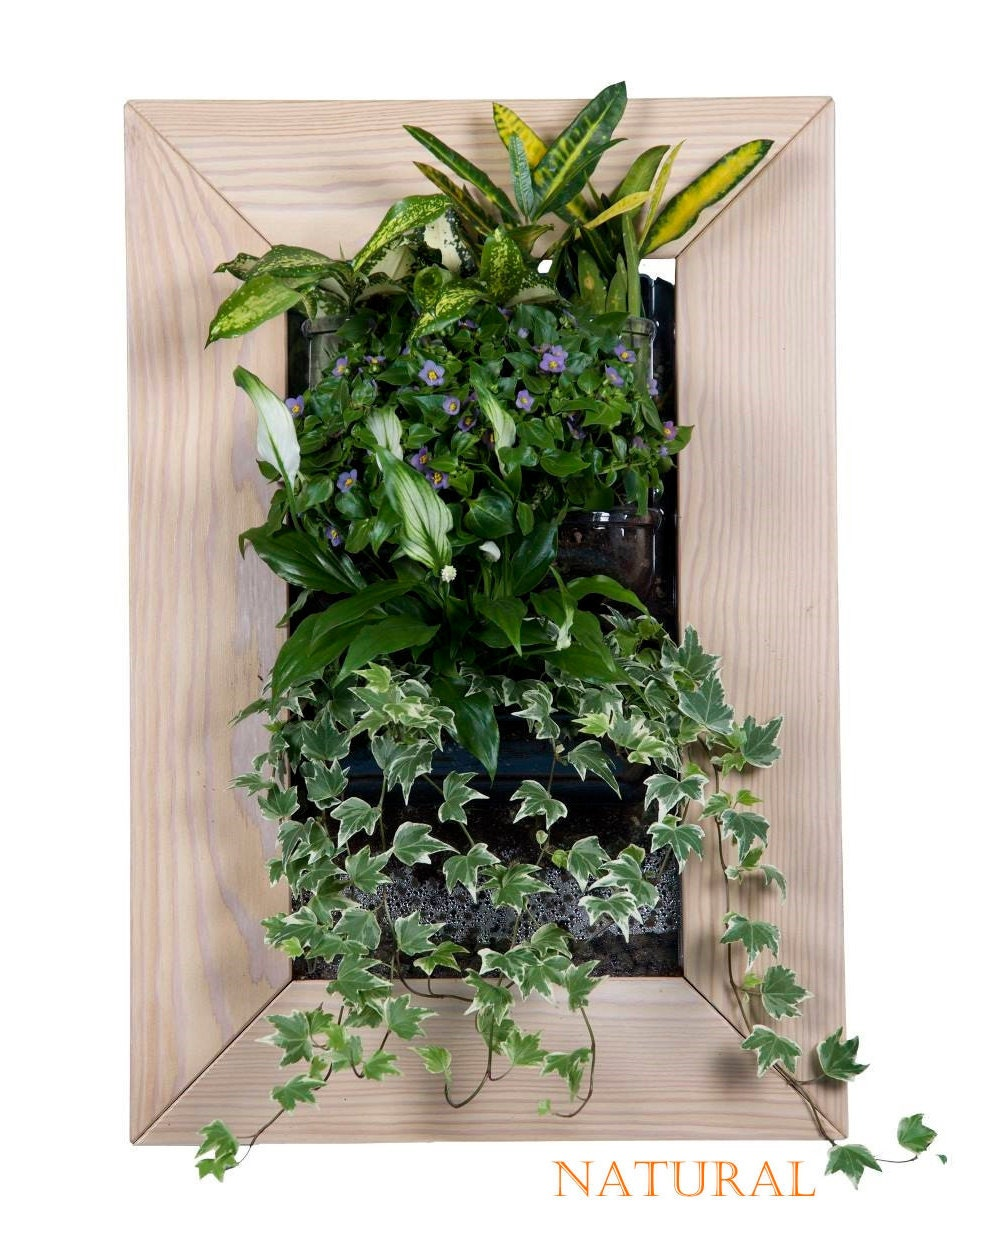 biovertigo wood vertical garden kit. Black Bedroom Furniture Sets. Home Design Ideas